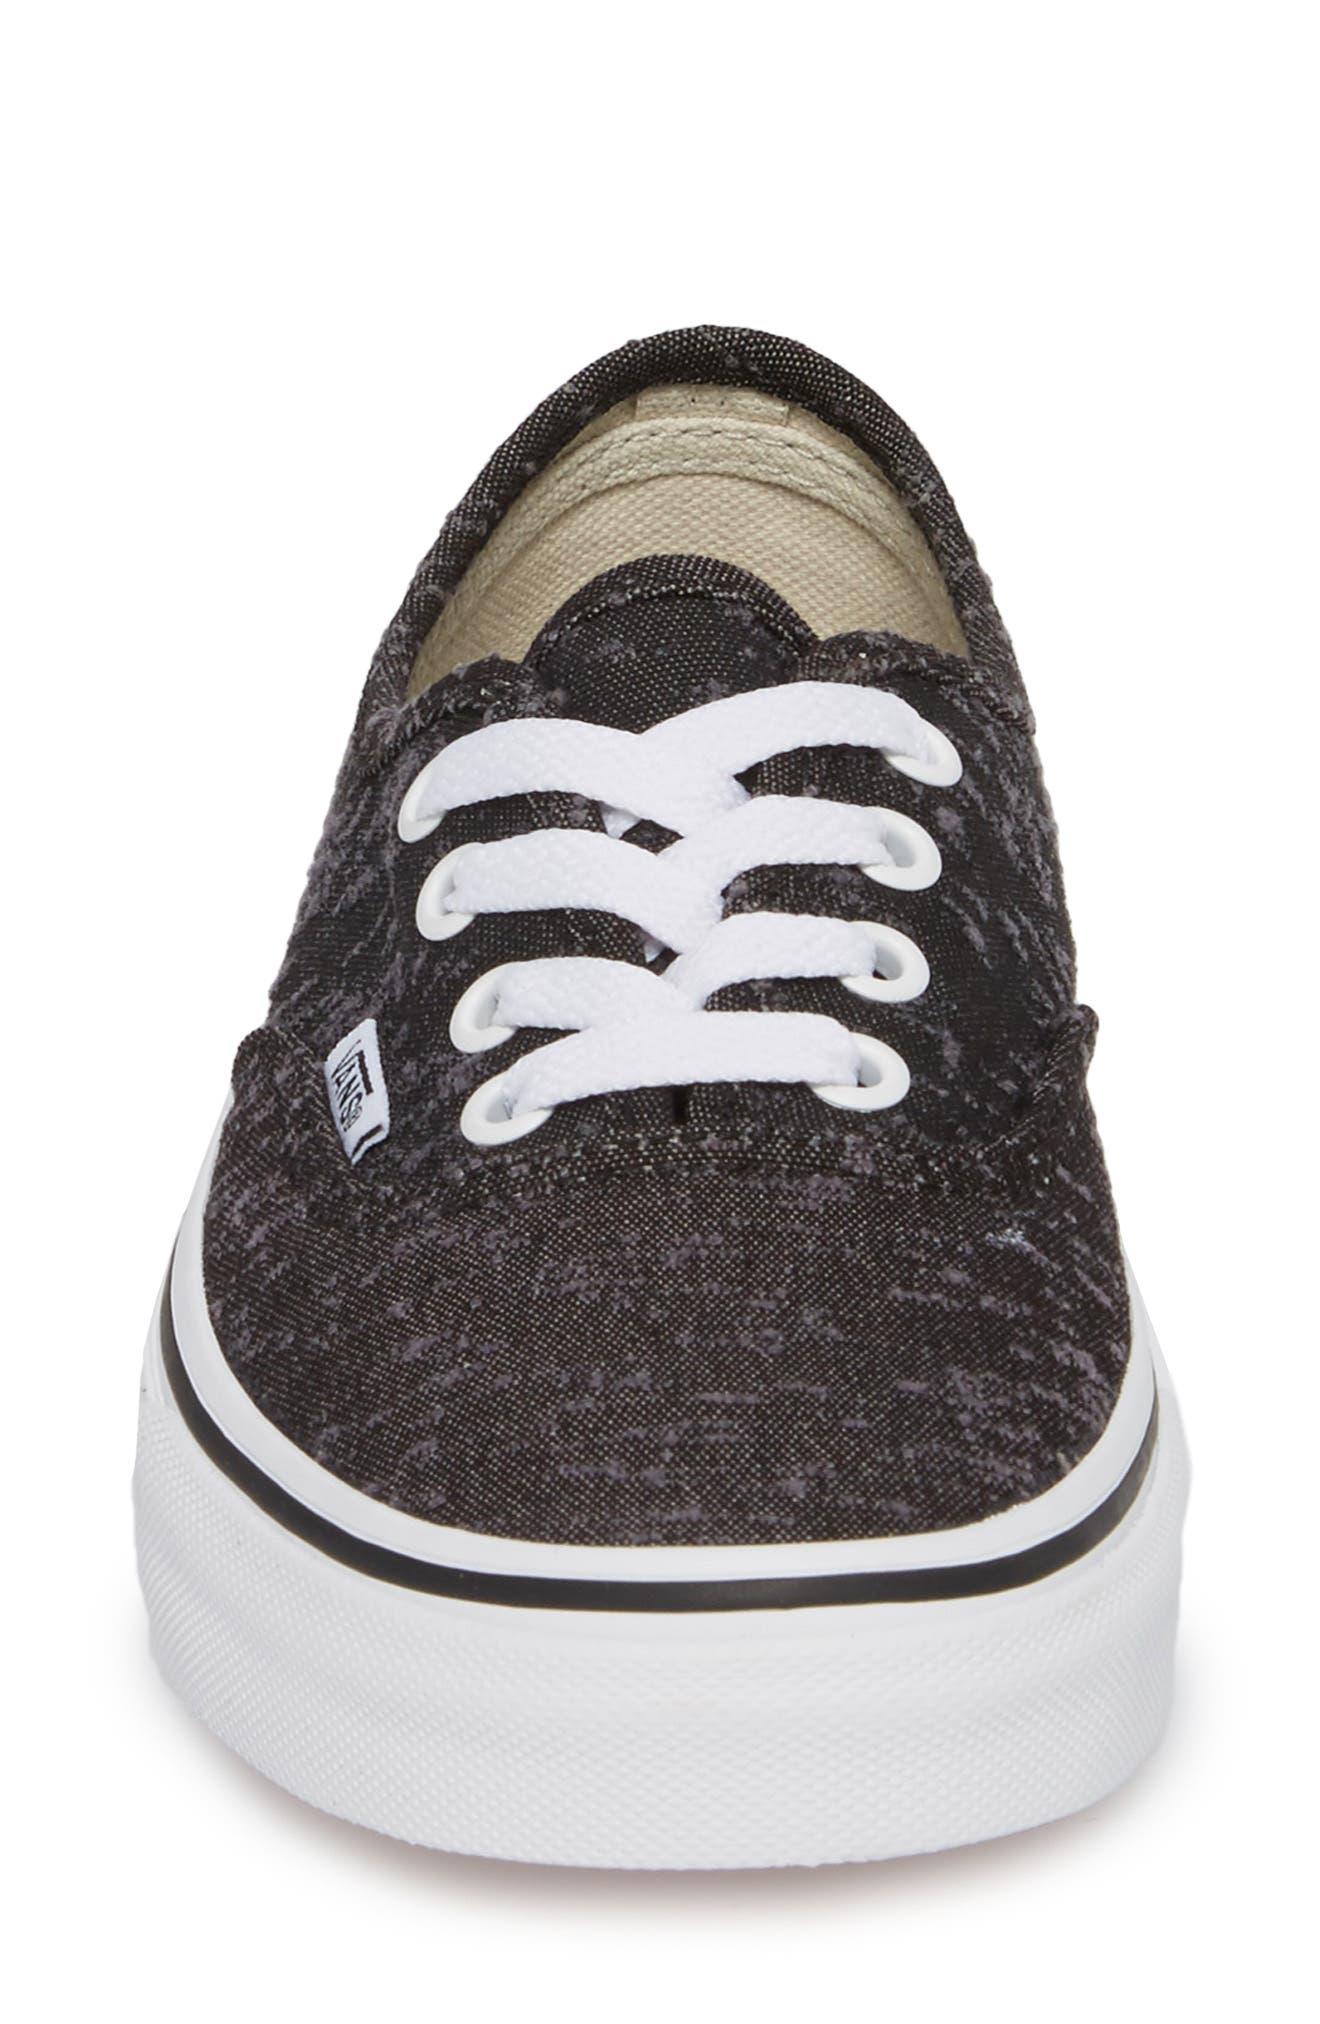 ,                             'Authentic' Sneaker,                             Alternate thumbnail 69, color,                             005